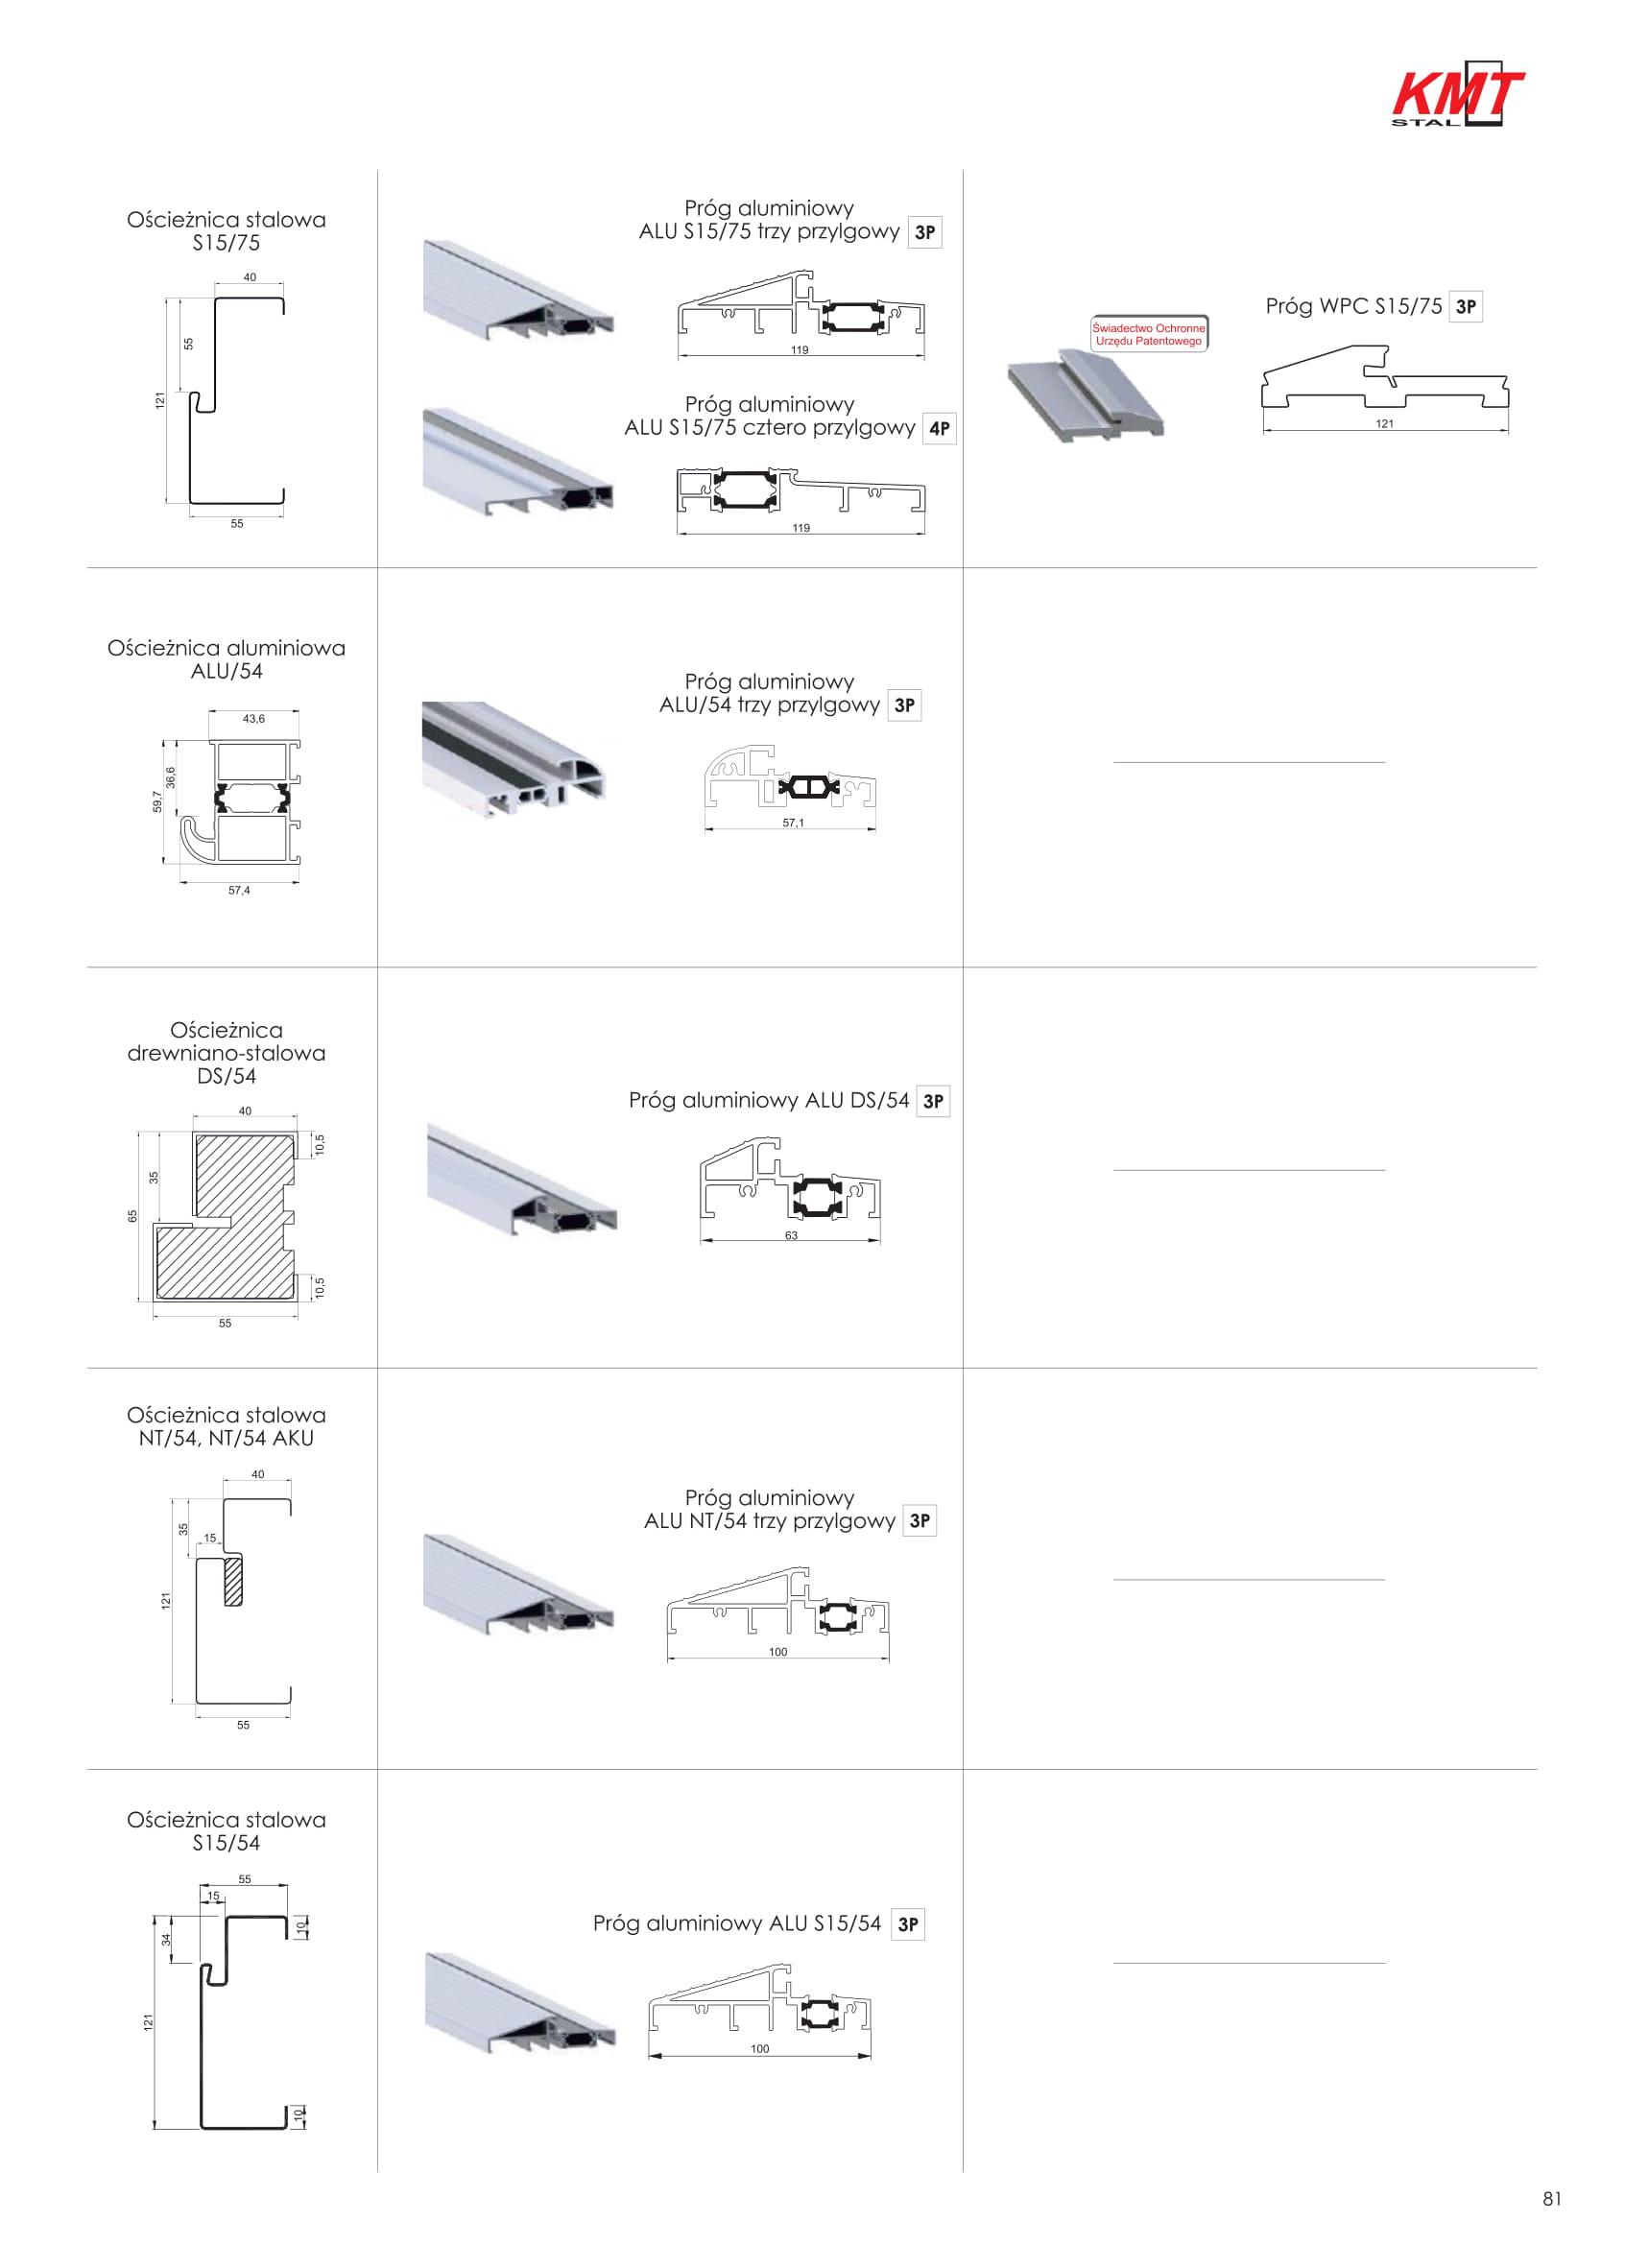 Katalog KMT